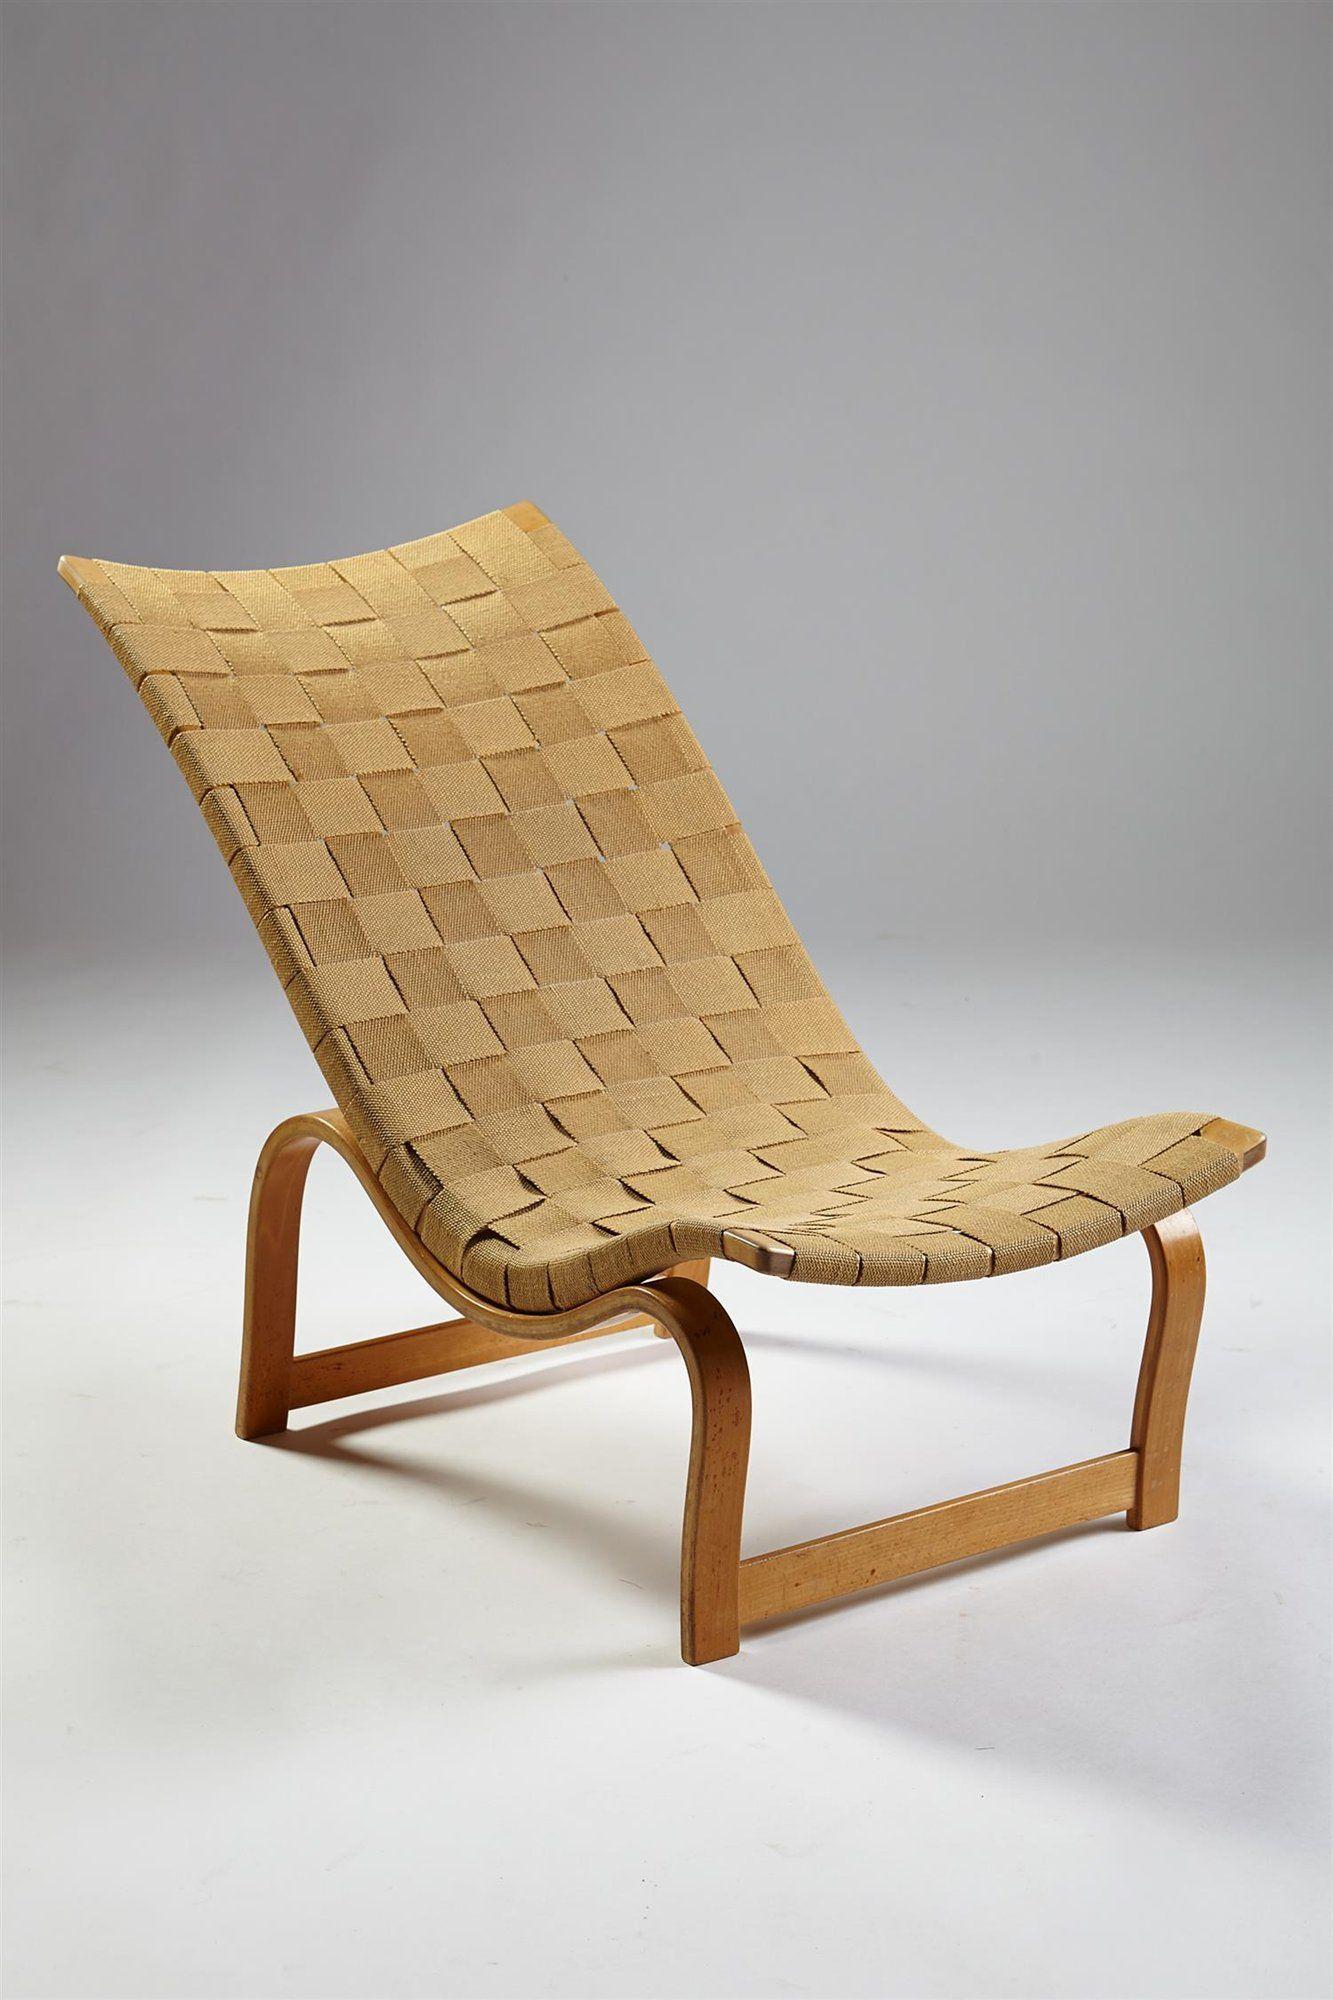 bruno mathsson for karl mathsson birch hemp webbing easy chair